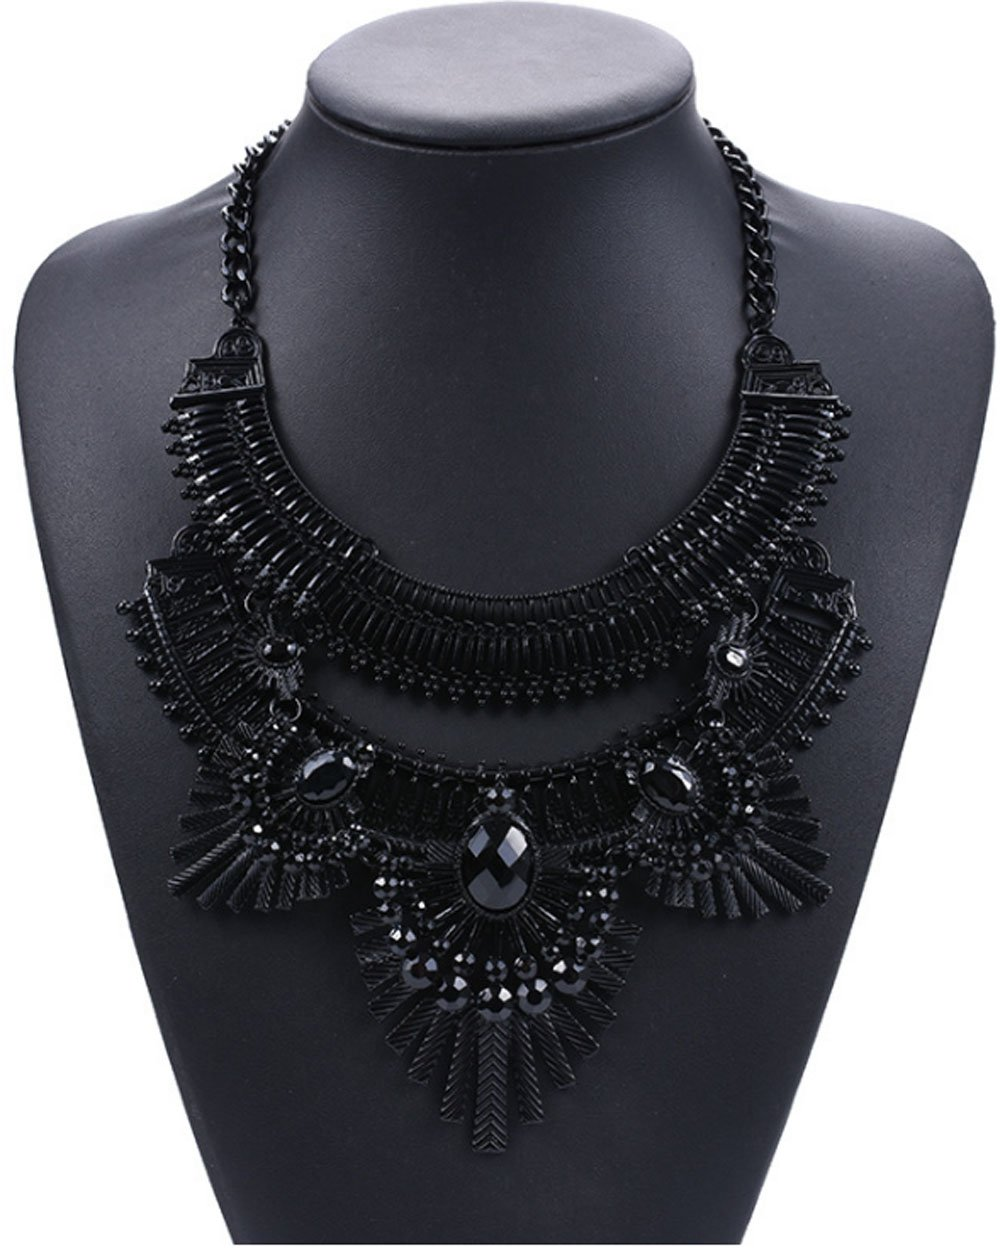 Shineland Hot Stunning Filigree Faceted Rhinestone Bib Exaggerated Multilayer Necklace (Black)